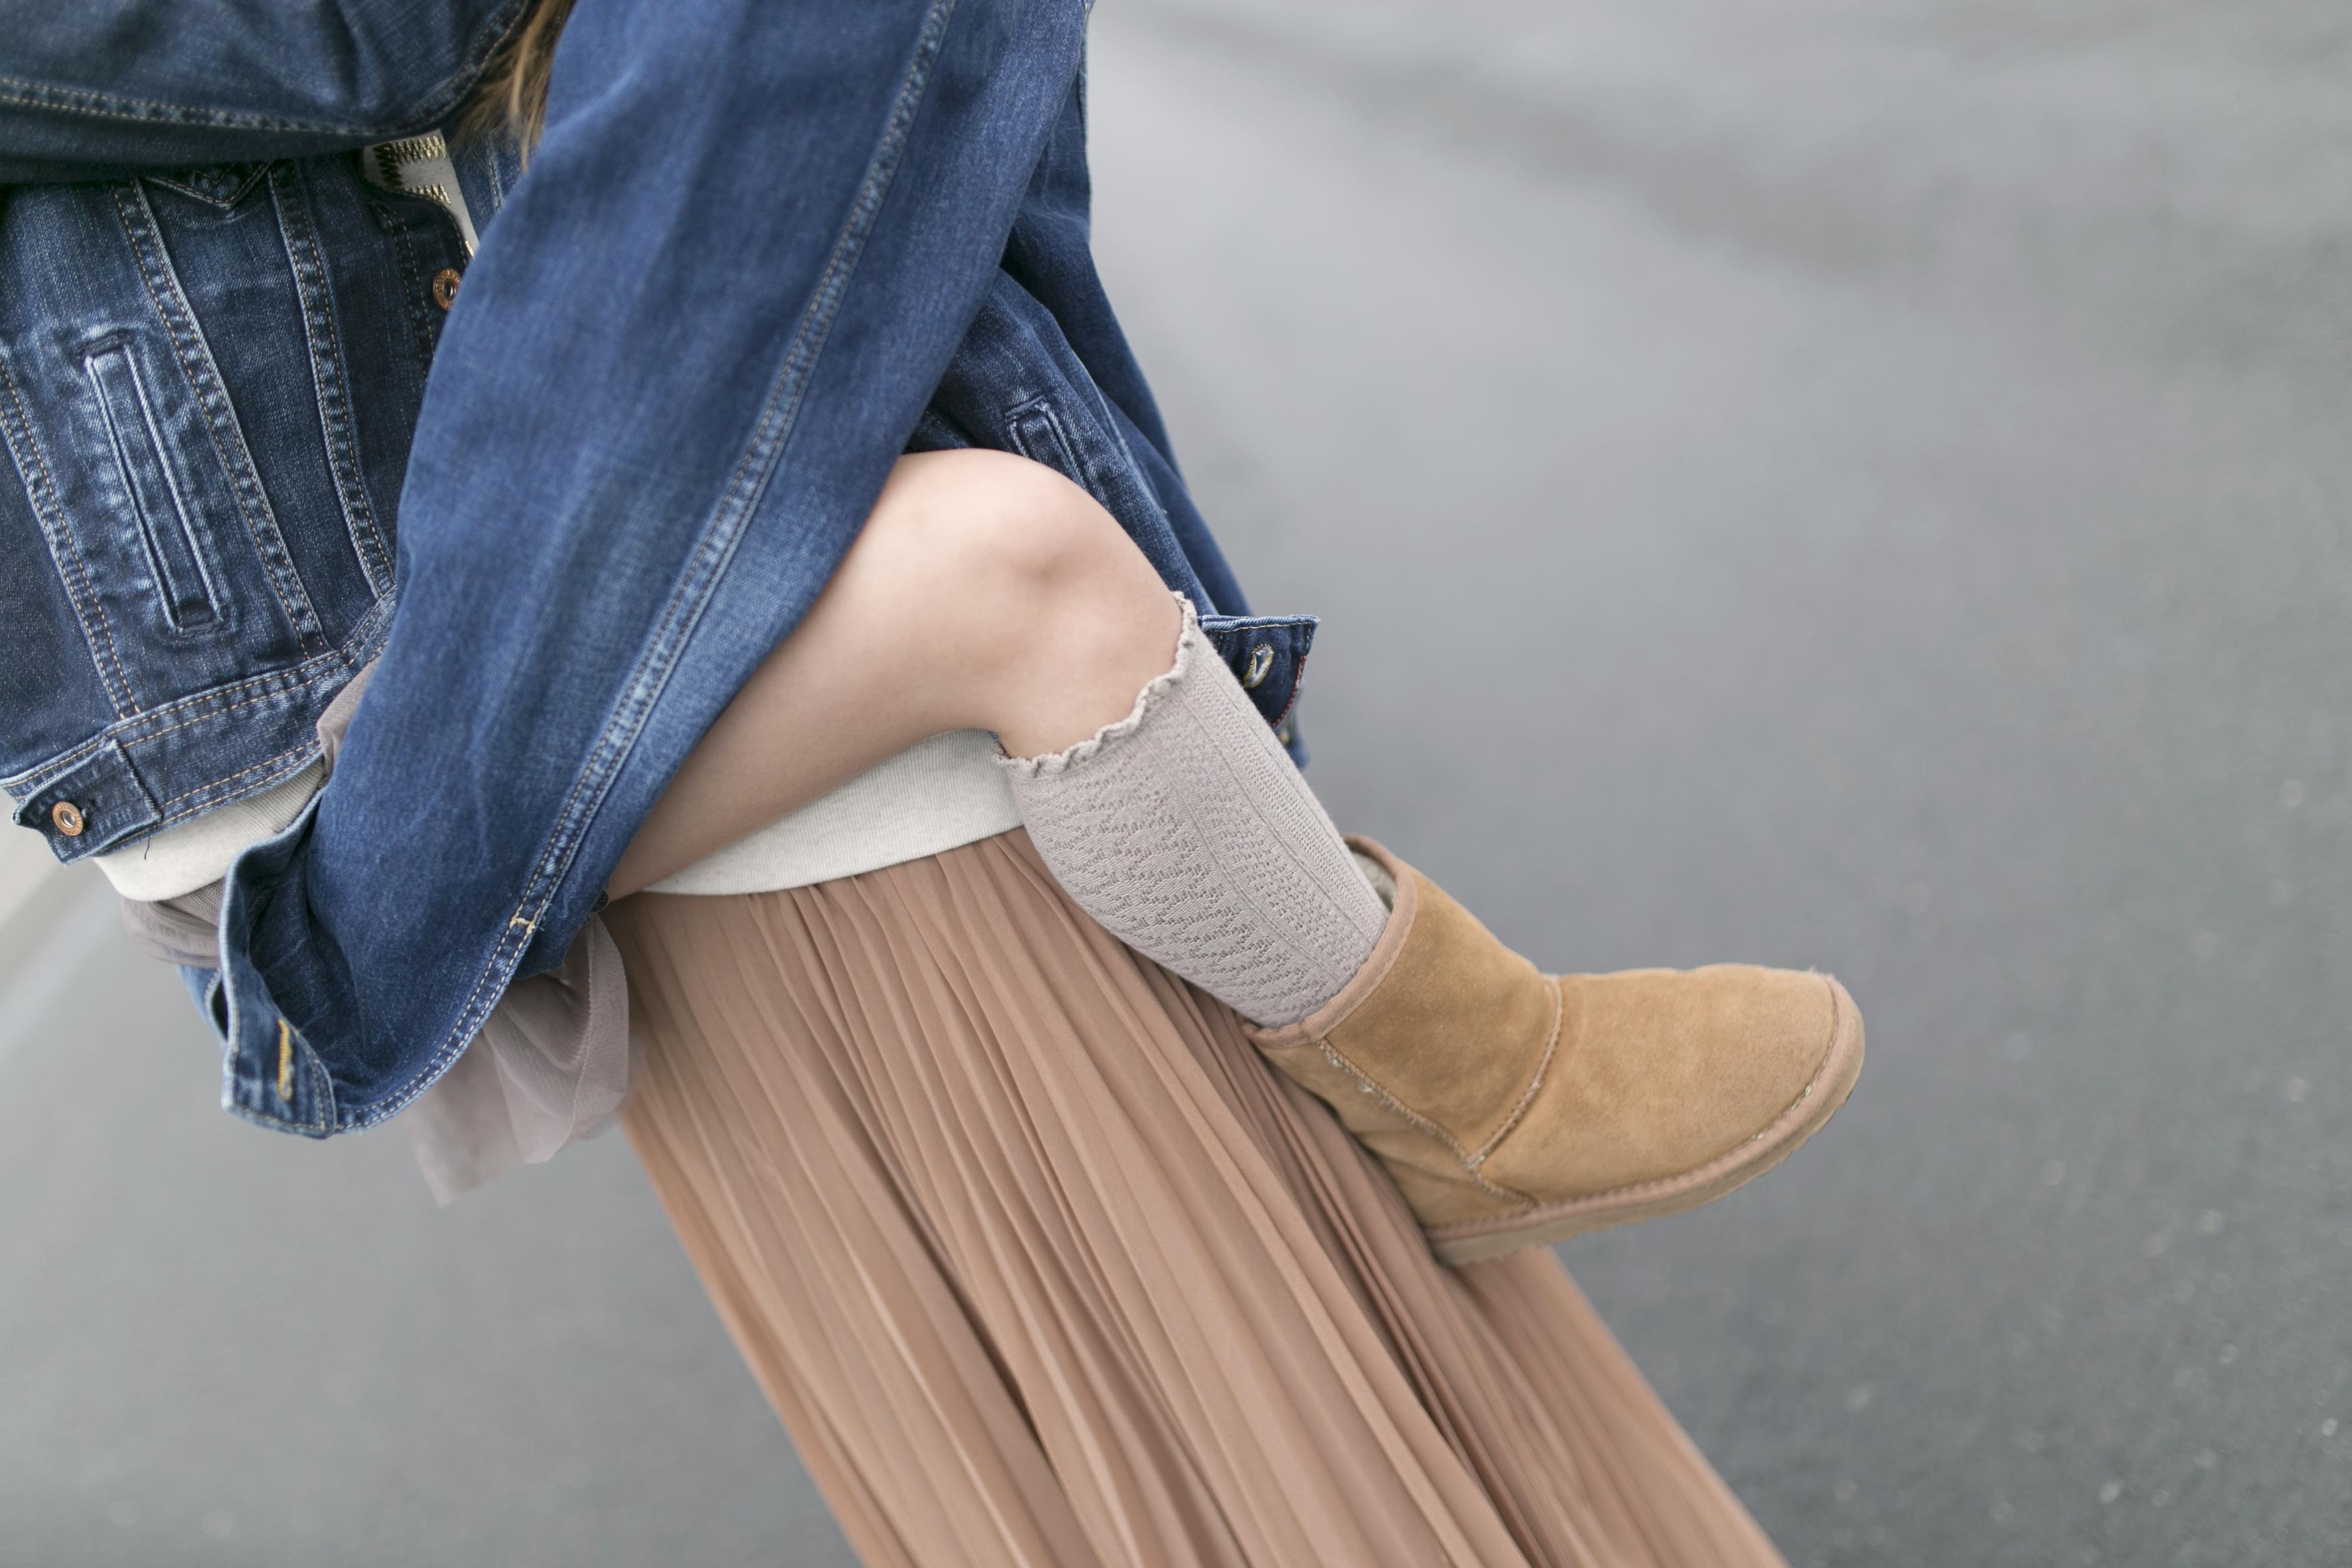 mother and daughter- pepe jeans- Ugg- zara- zarakids- streetstyle- descalzaporelparque-coruña-Ugg look-denim-madre e hija-fashion